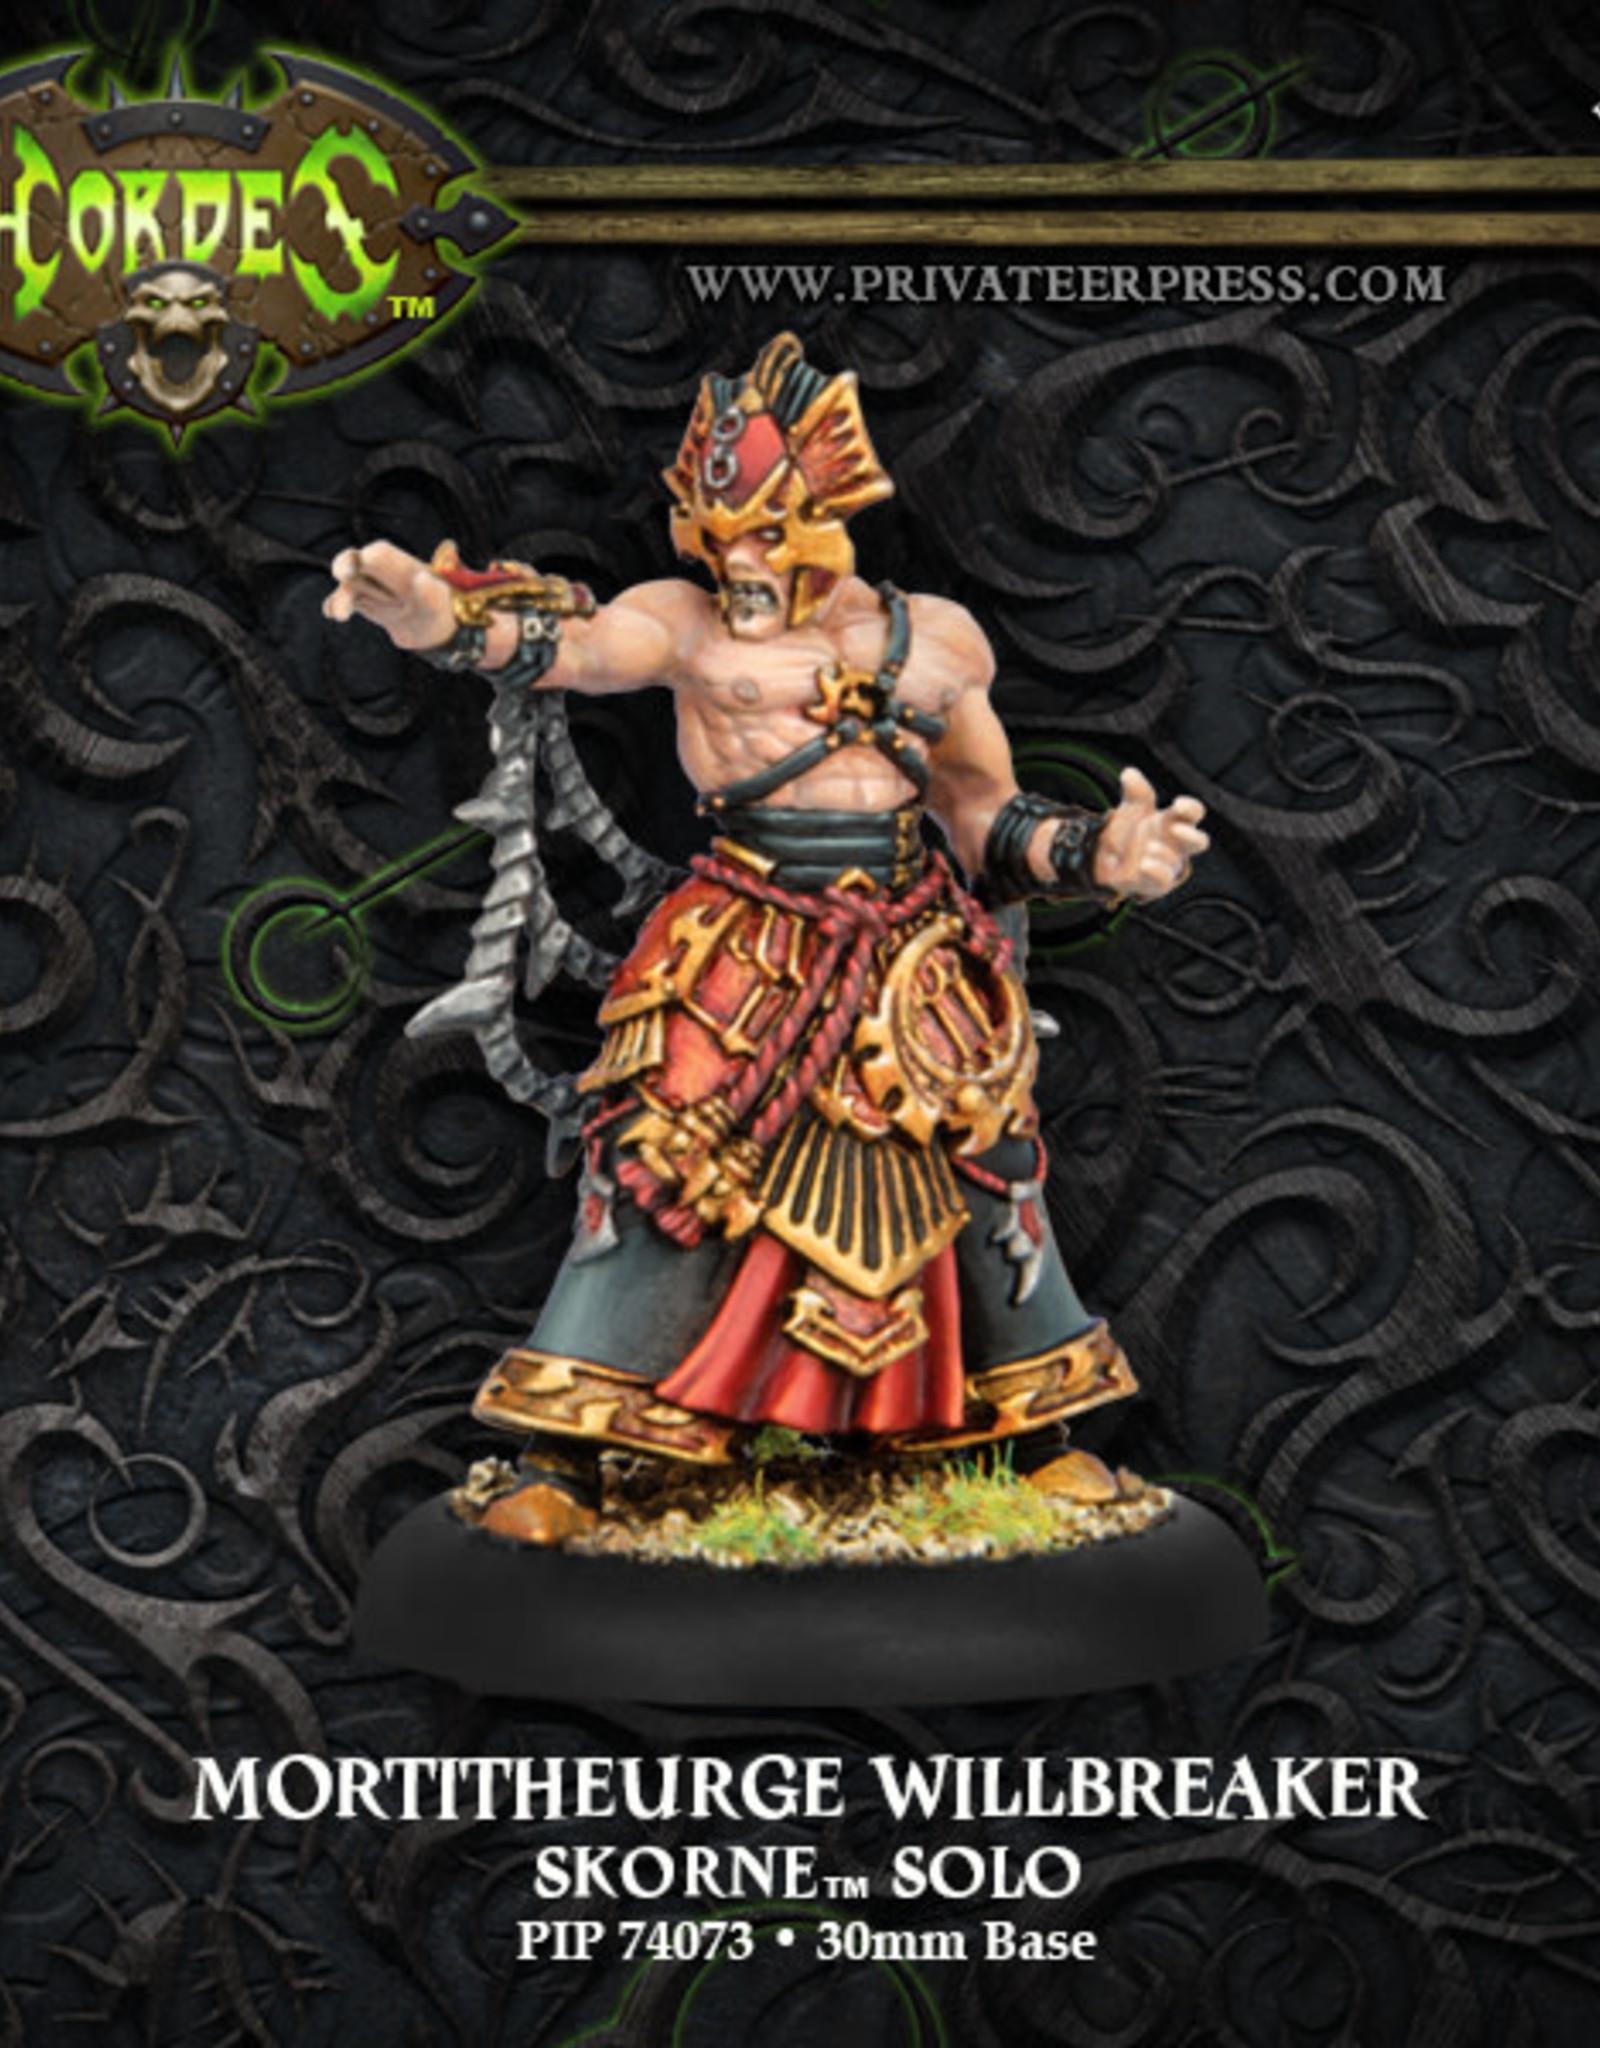 Hordes Skorne - Mortitheurge Willbreaker